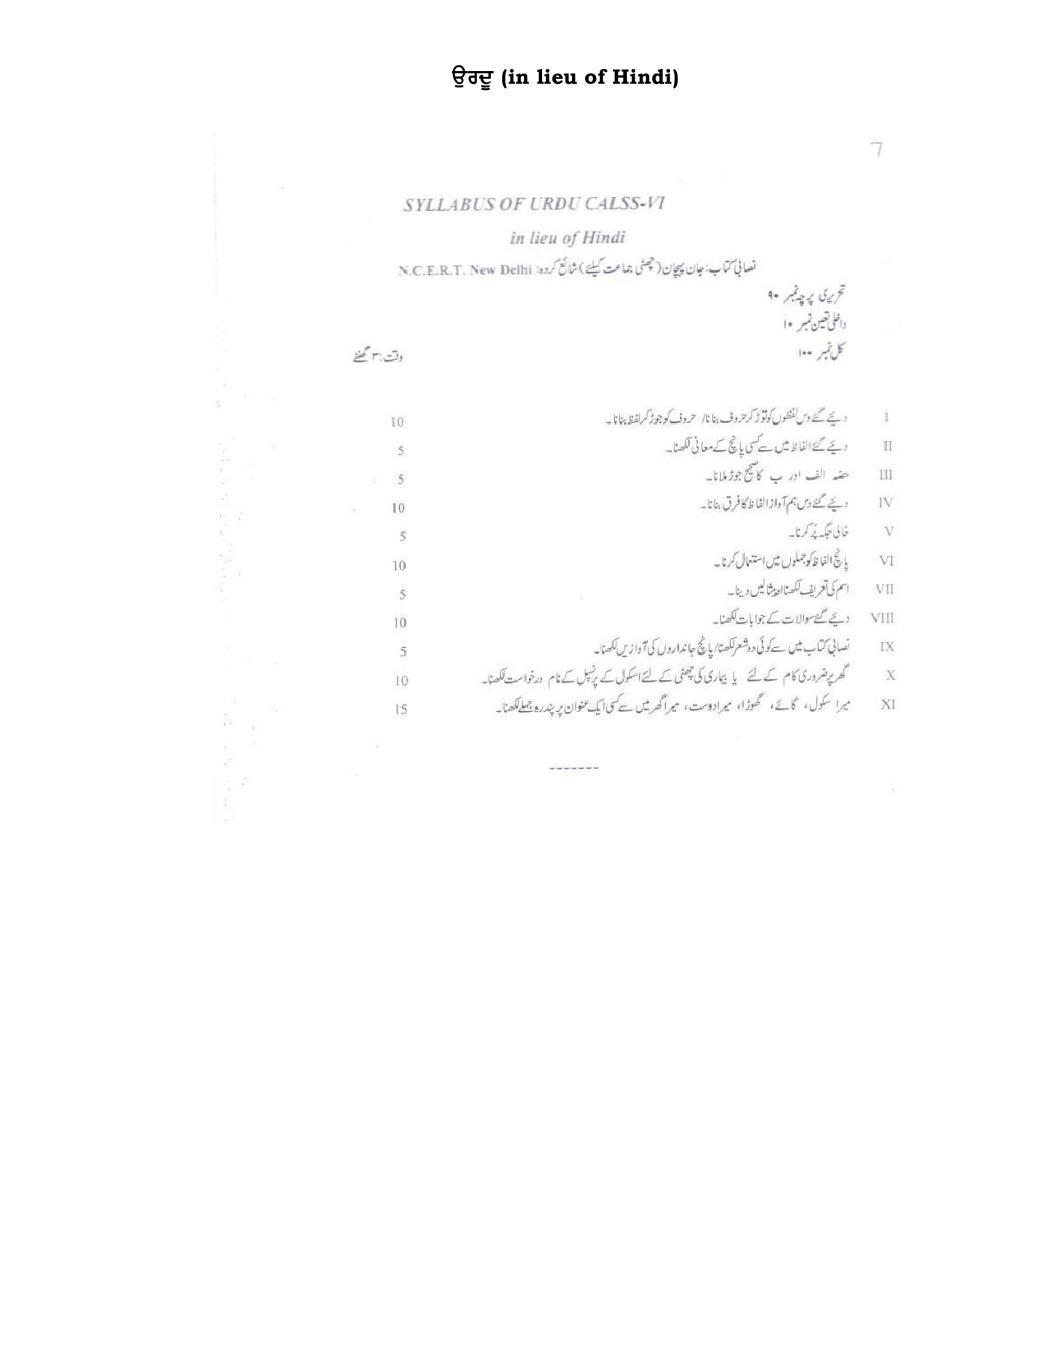 PSEB Syllabus 2020-21 for Class 6 Urdu - Page 1